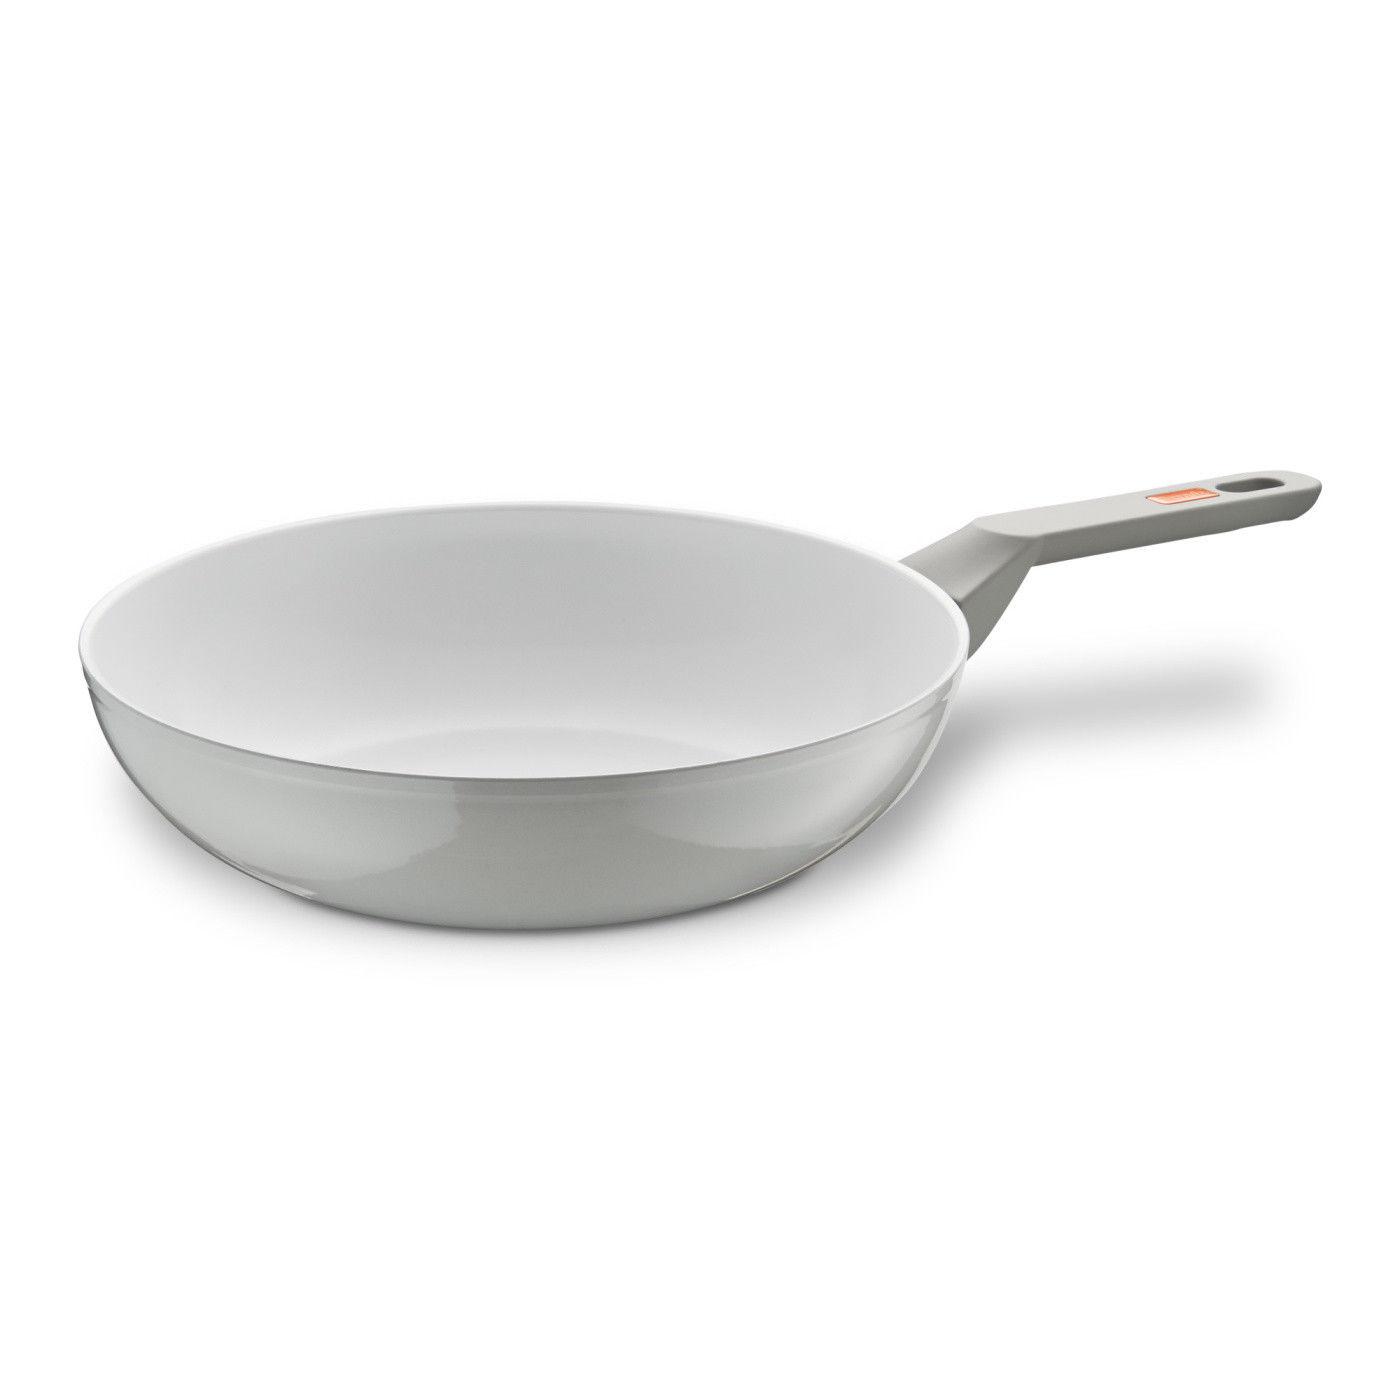 berndes veggie induction white wok wokpfanne pfanne 28 cm. Black Bedroom Furniture Sets. Home Design Ideas